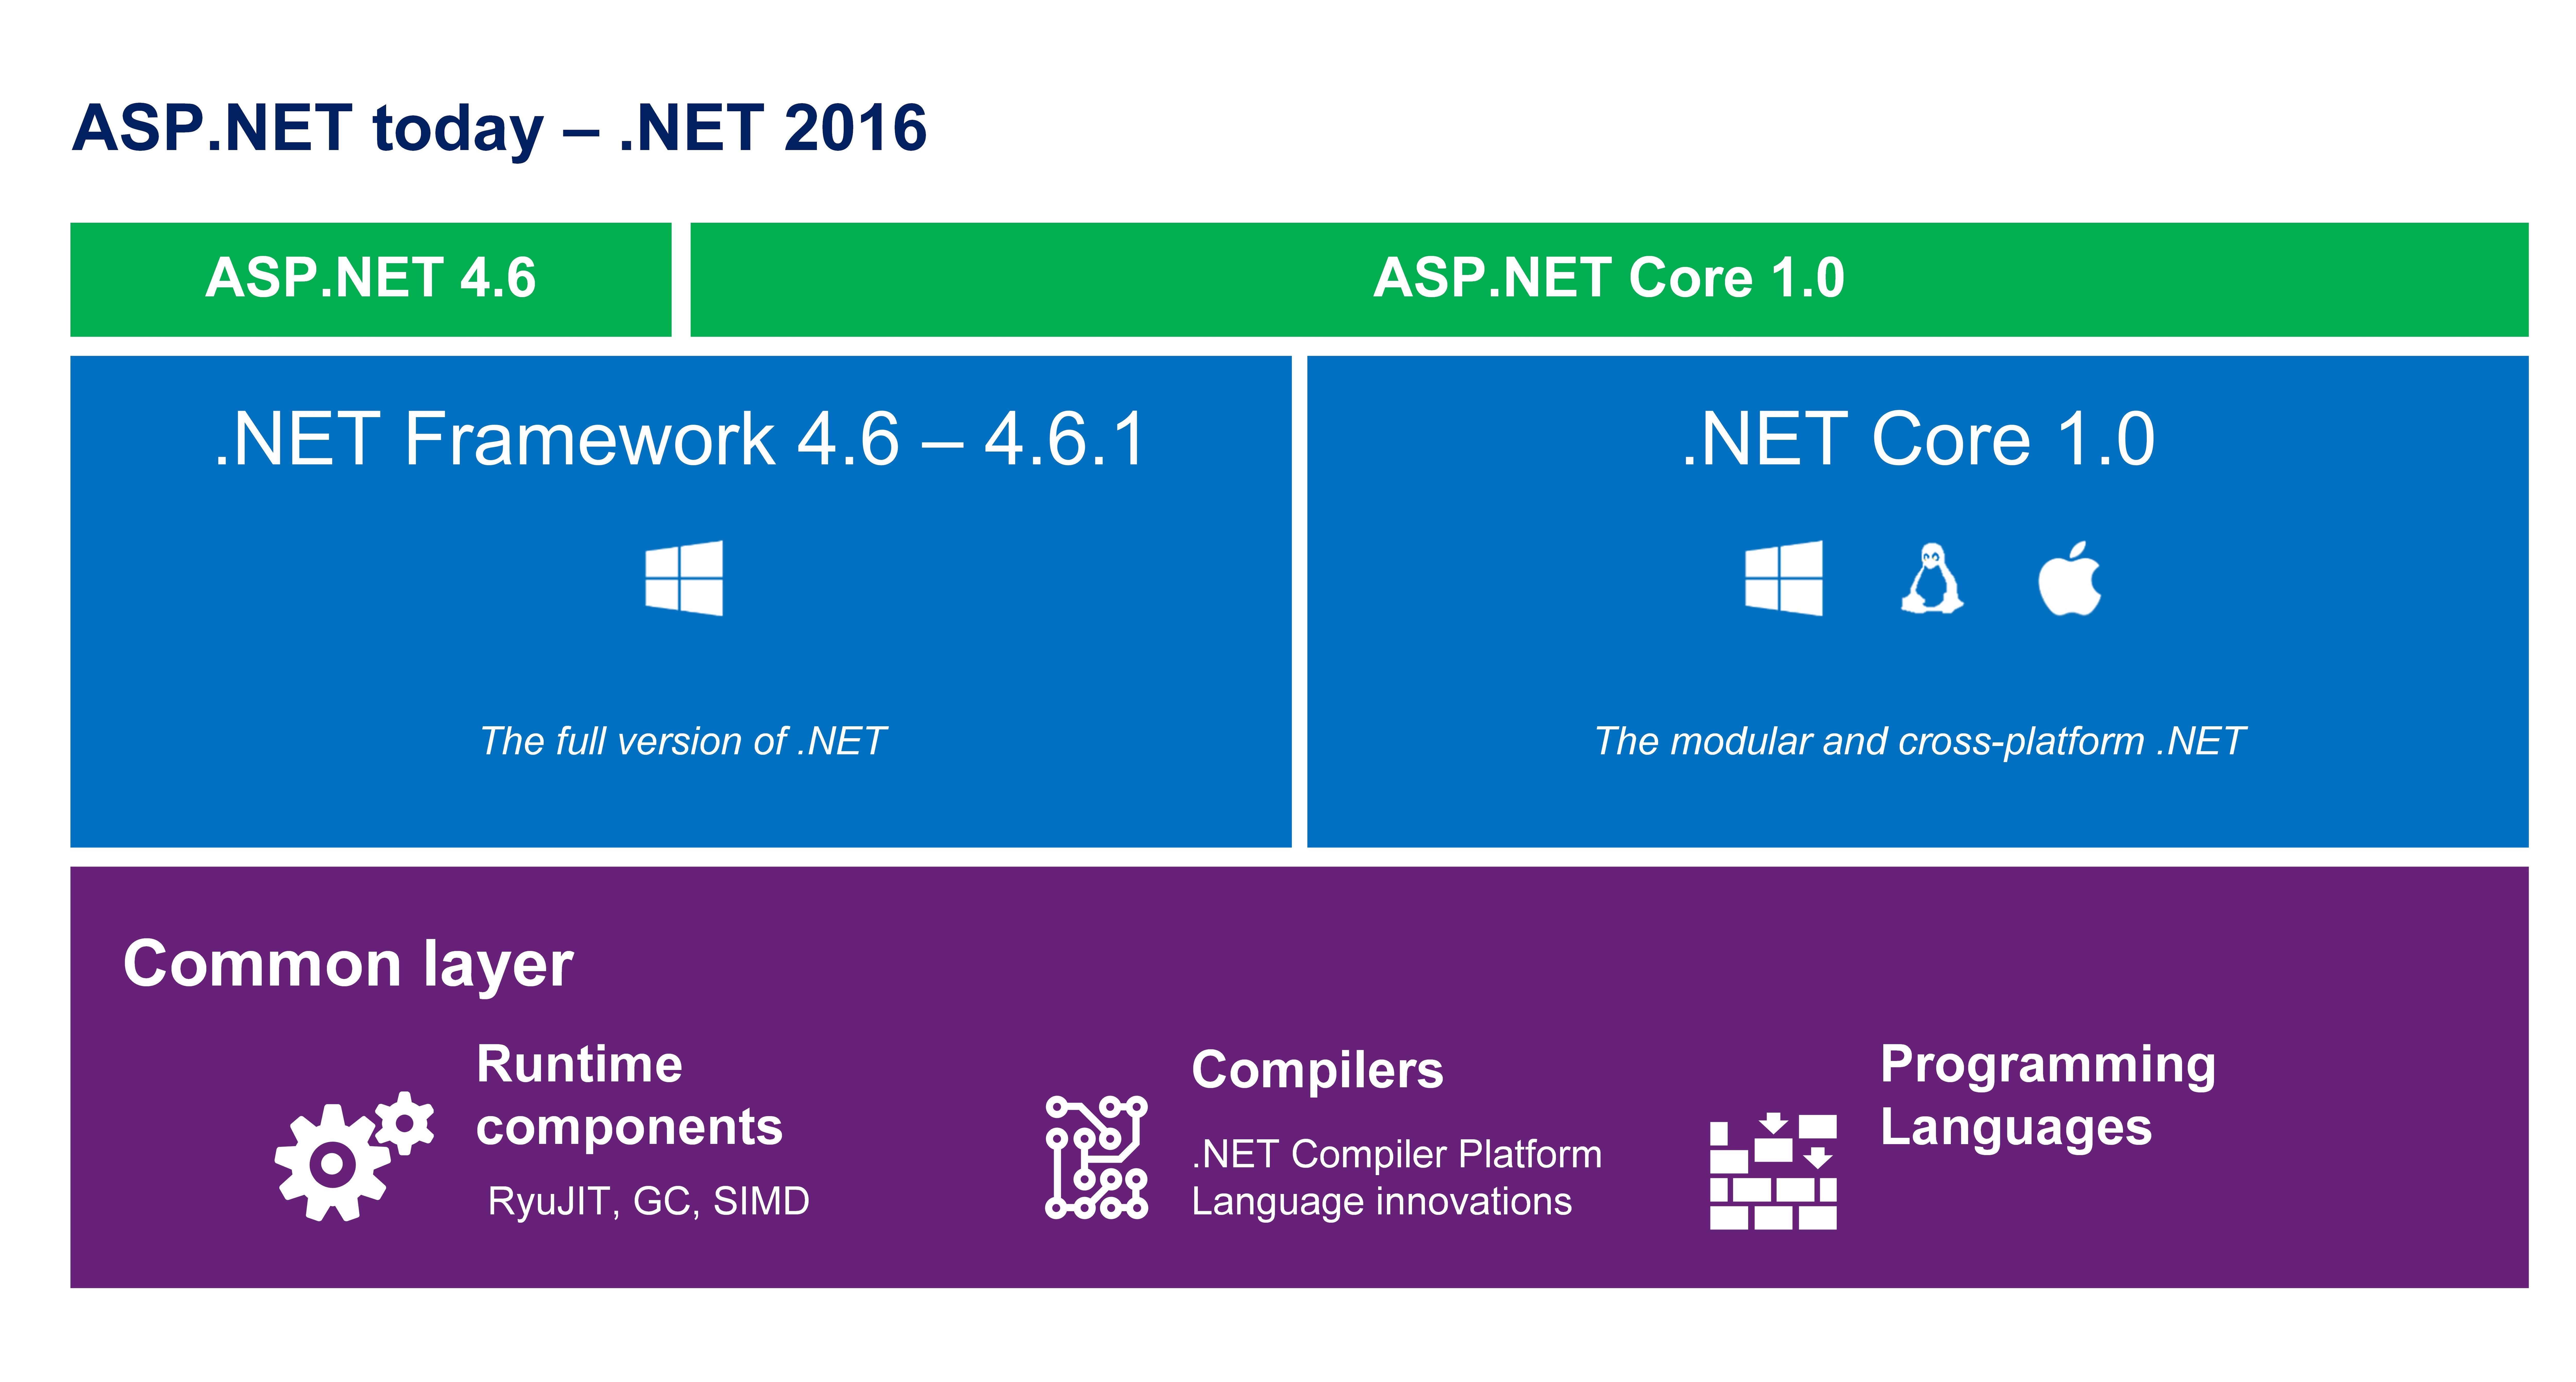 ASP.NET Core 1.0. Platform. Part 2. ASP.NET Today or what to choose?